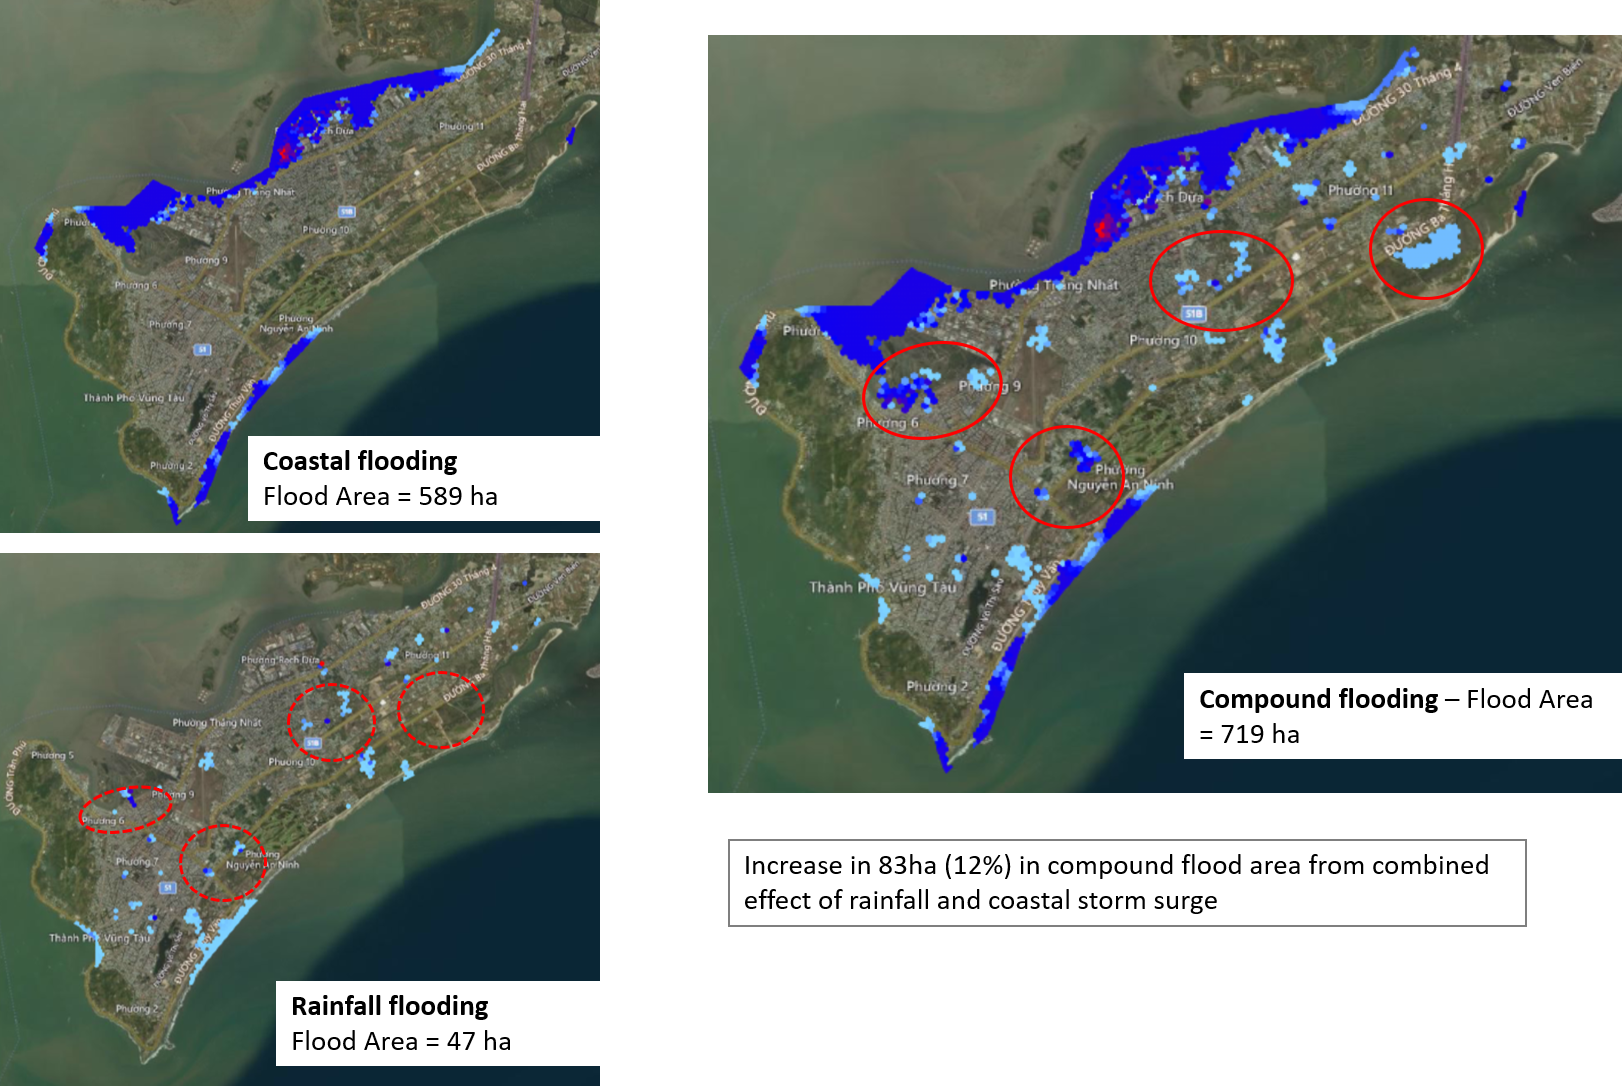 Figure 2: Compound Flooding Assessment - Example for a city in Vietnam (SJ-NTU Corp Lab proprietary platform)